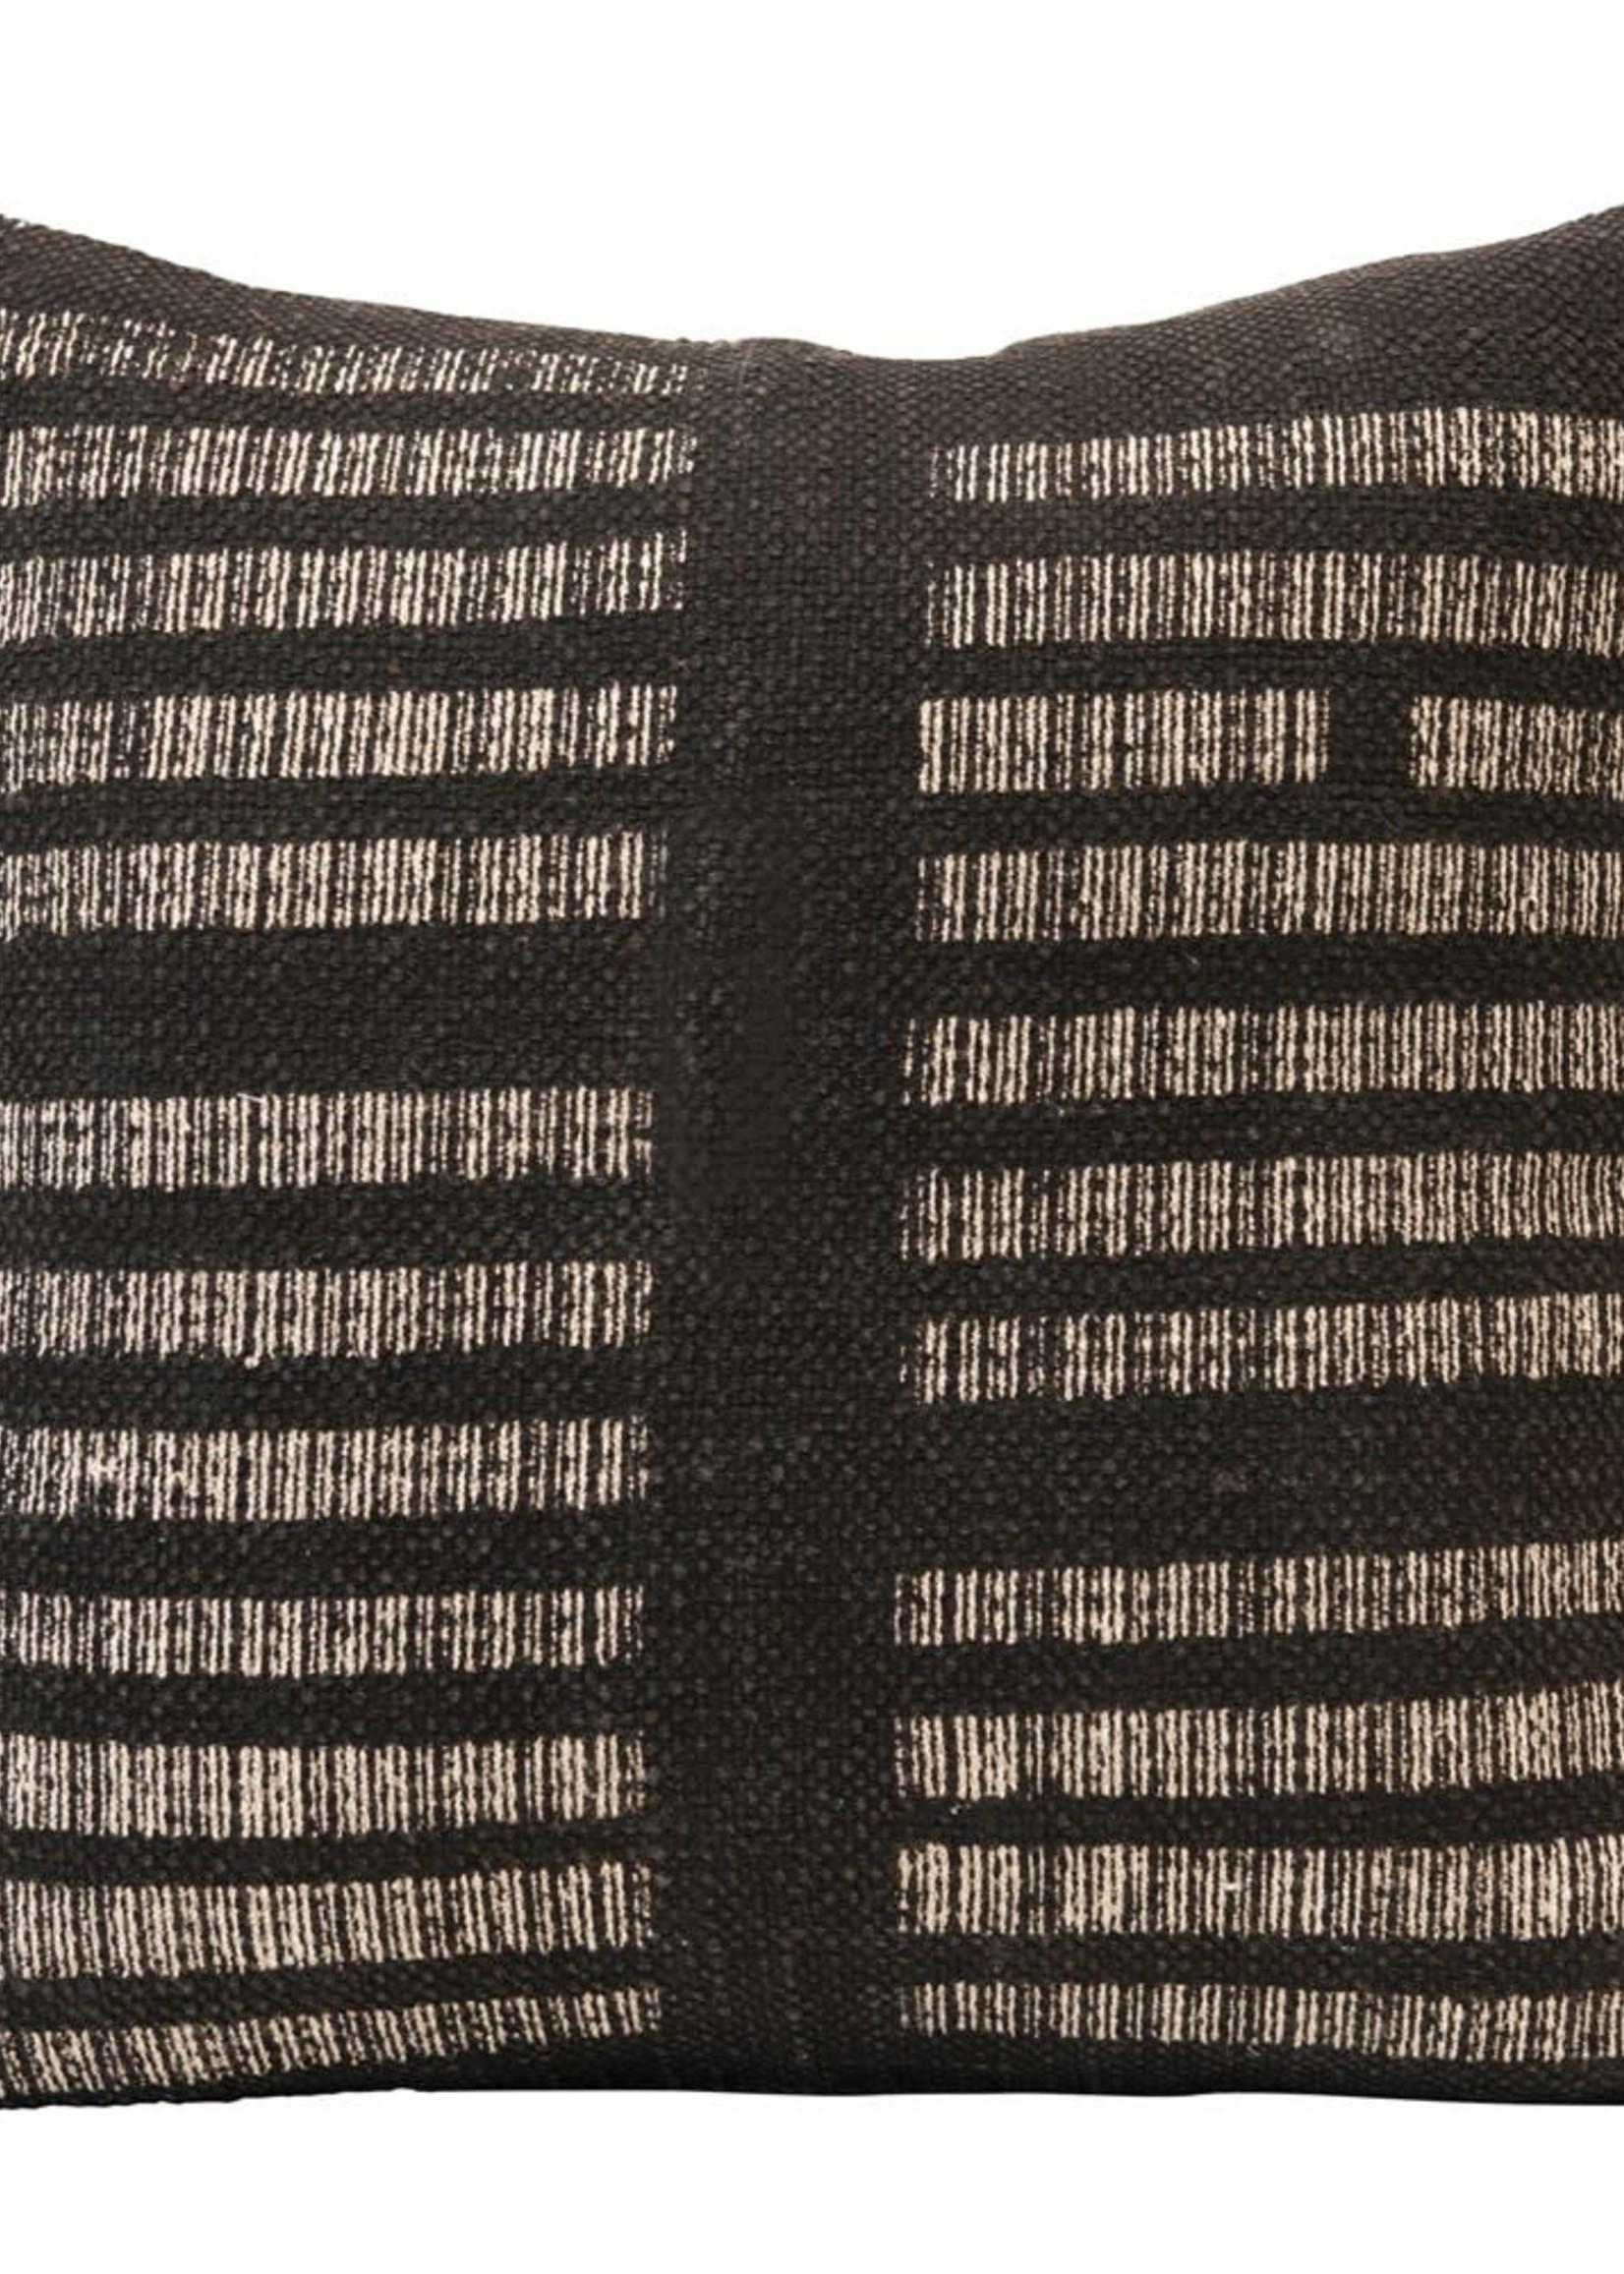 "20"" Sq Cotton Pillow, White & Black"